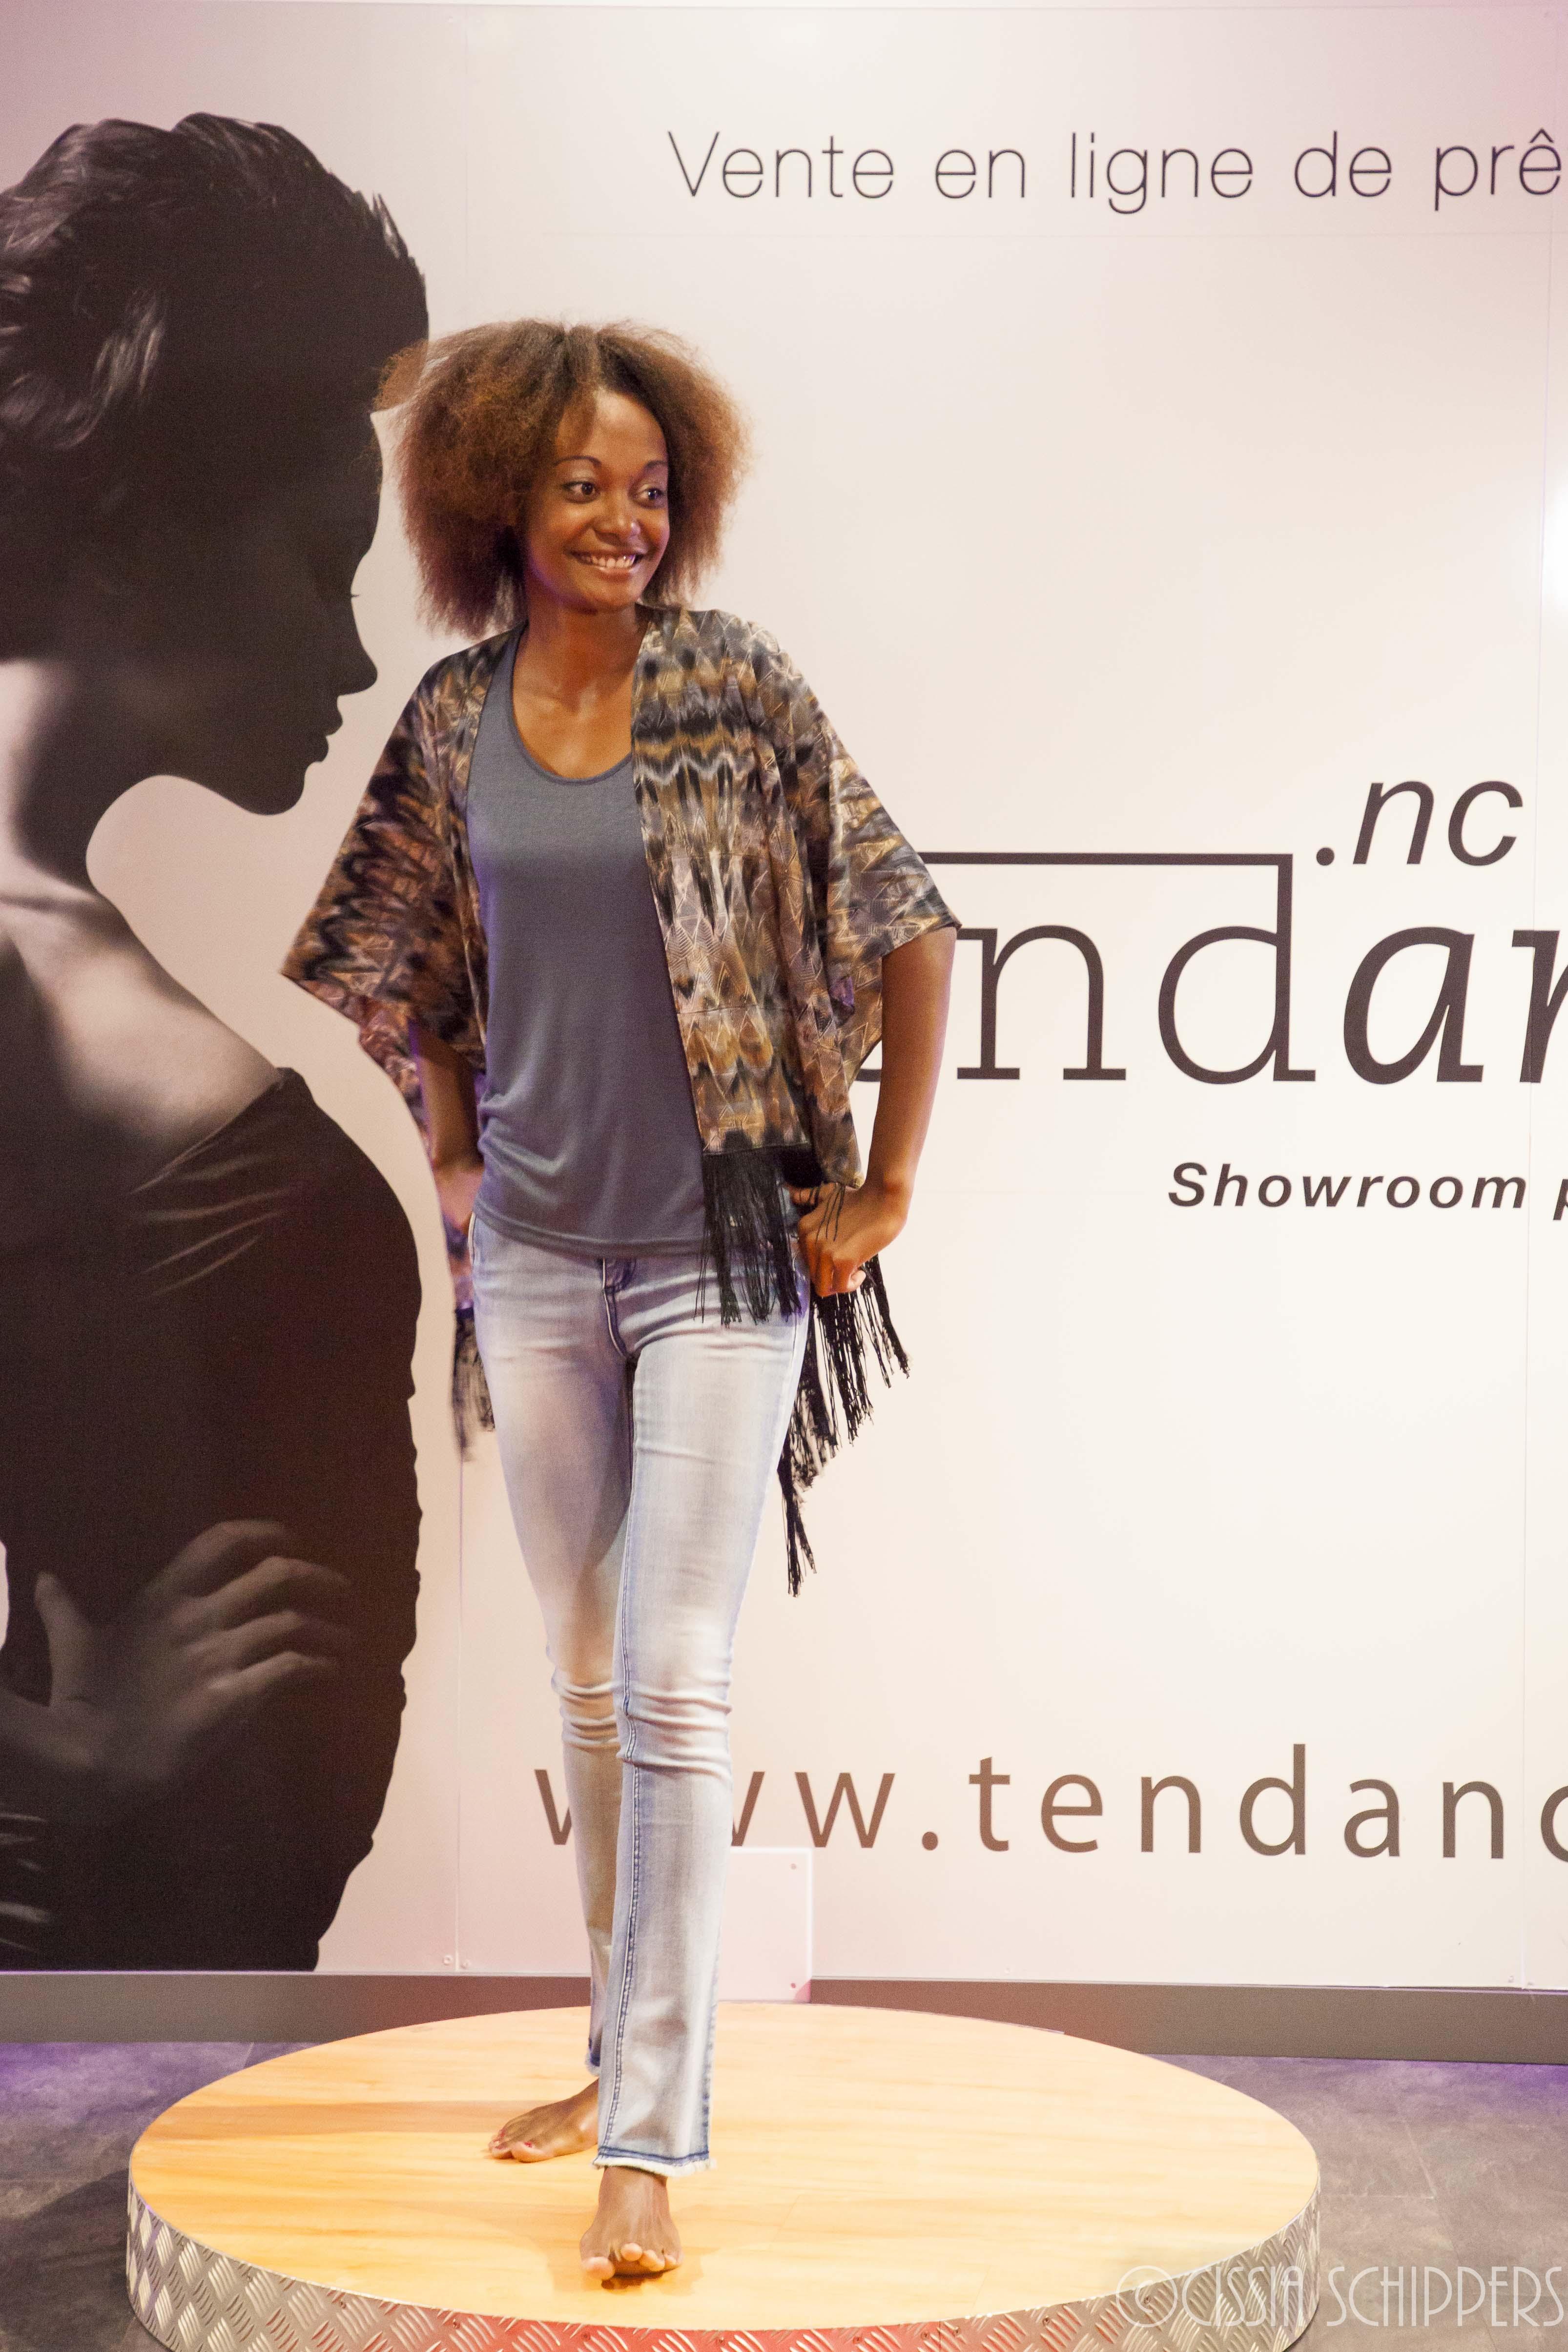 Tendance NC 2017 by Cissia Schippers photographe-7831